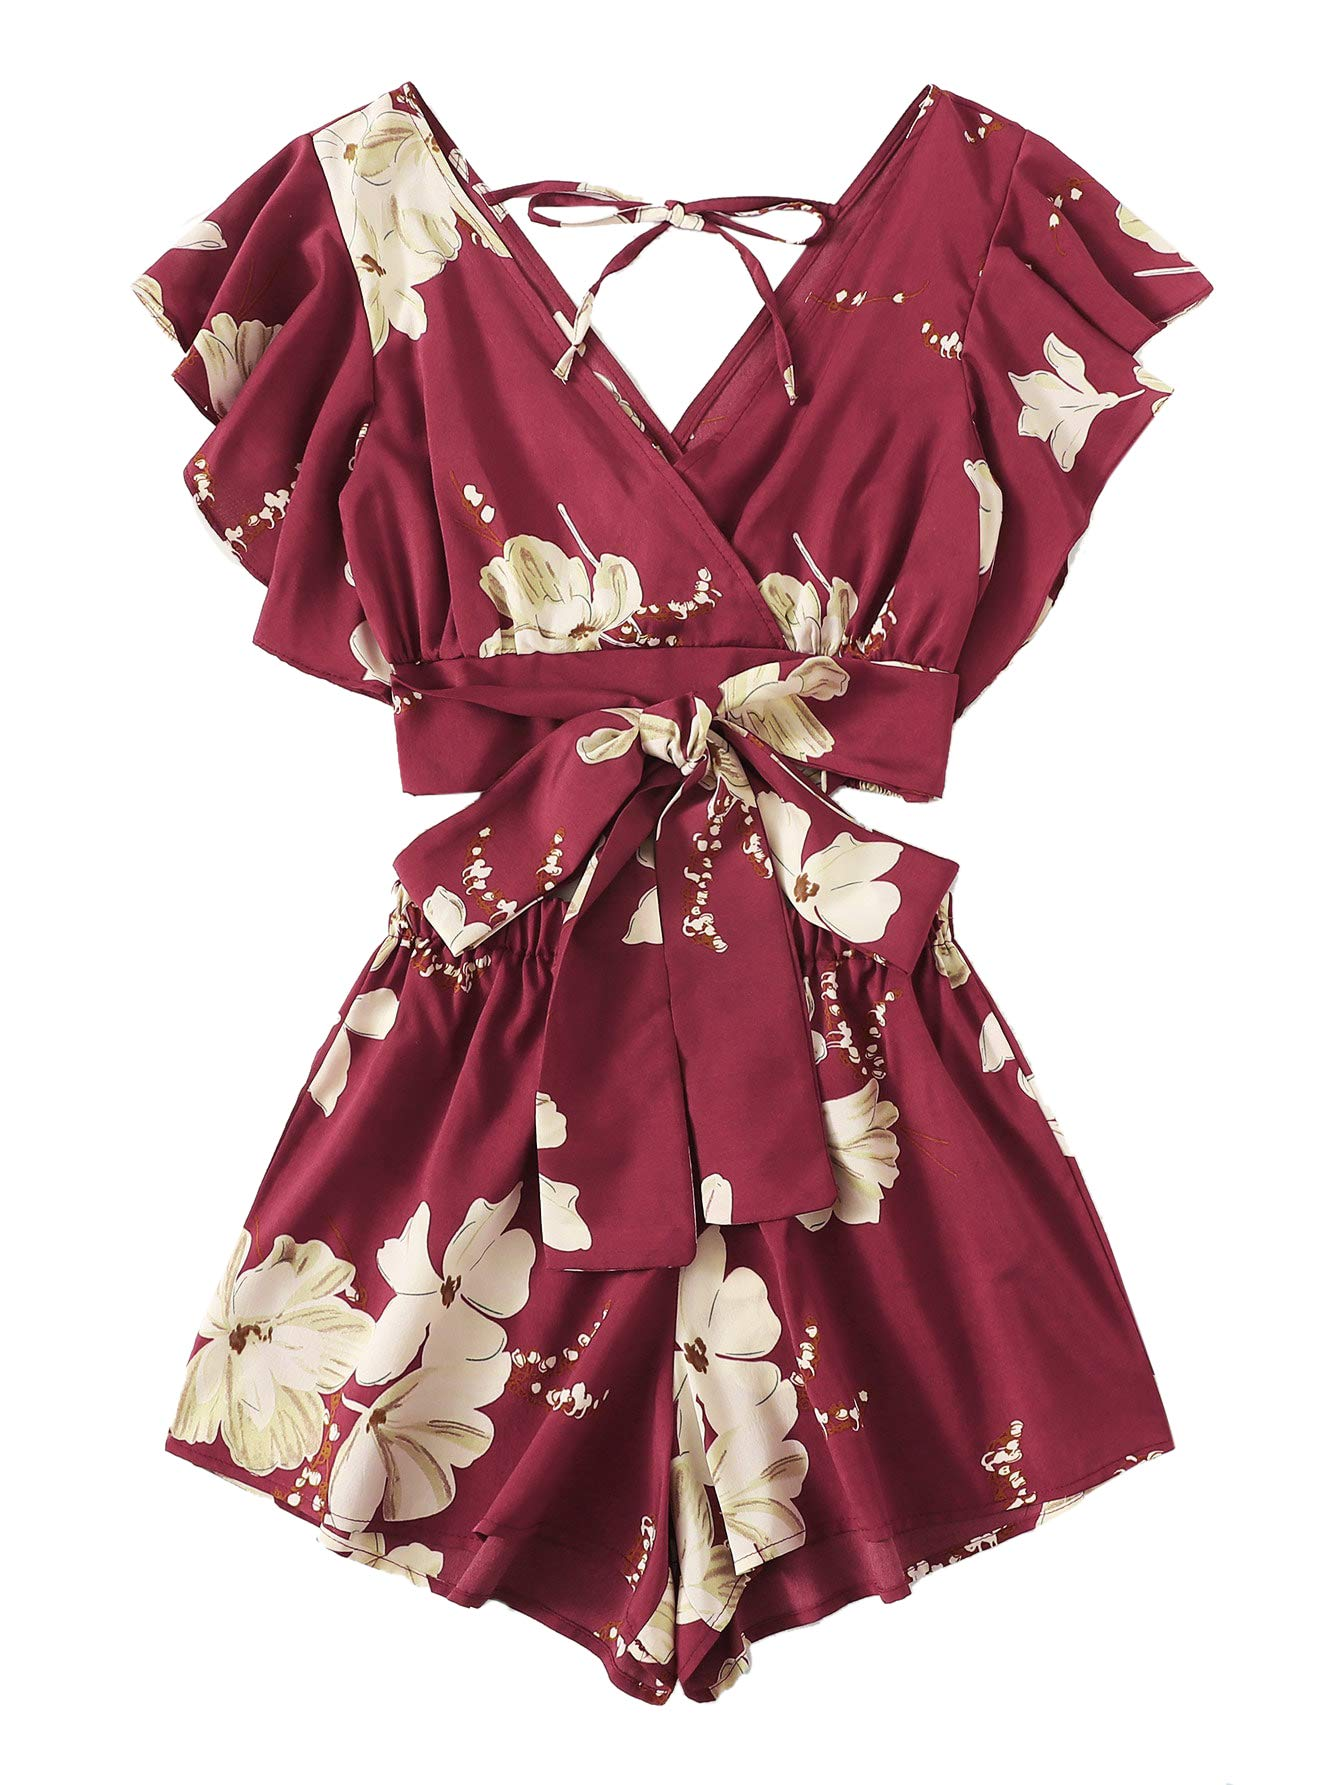 SweatyRocks Women's 2 Piece Boho Butterfly Sleeve Knot Front Crop Top with Shorts Set